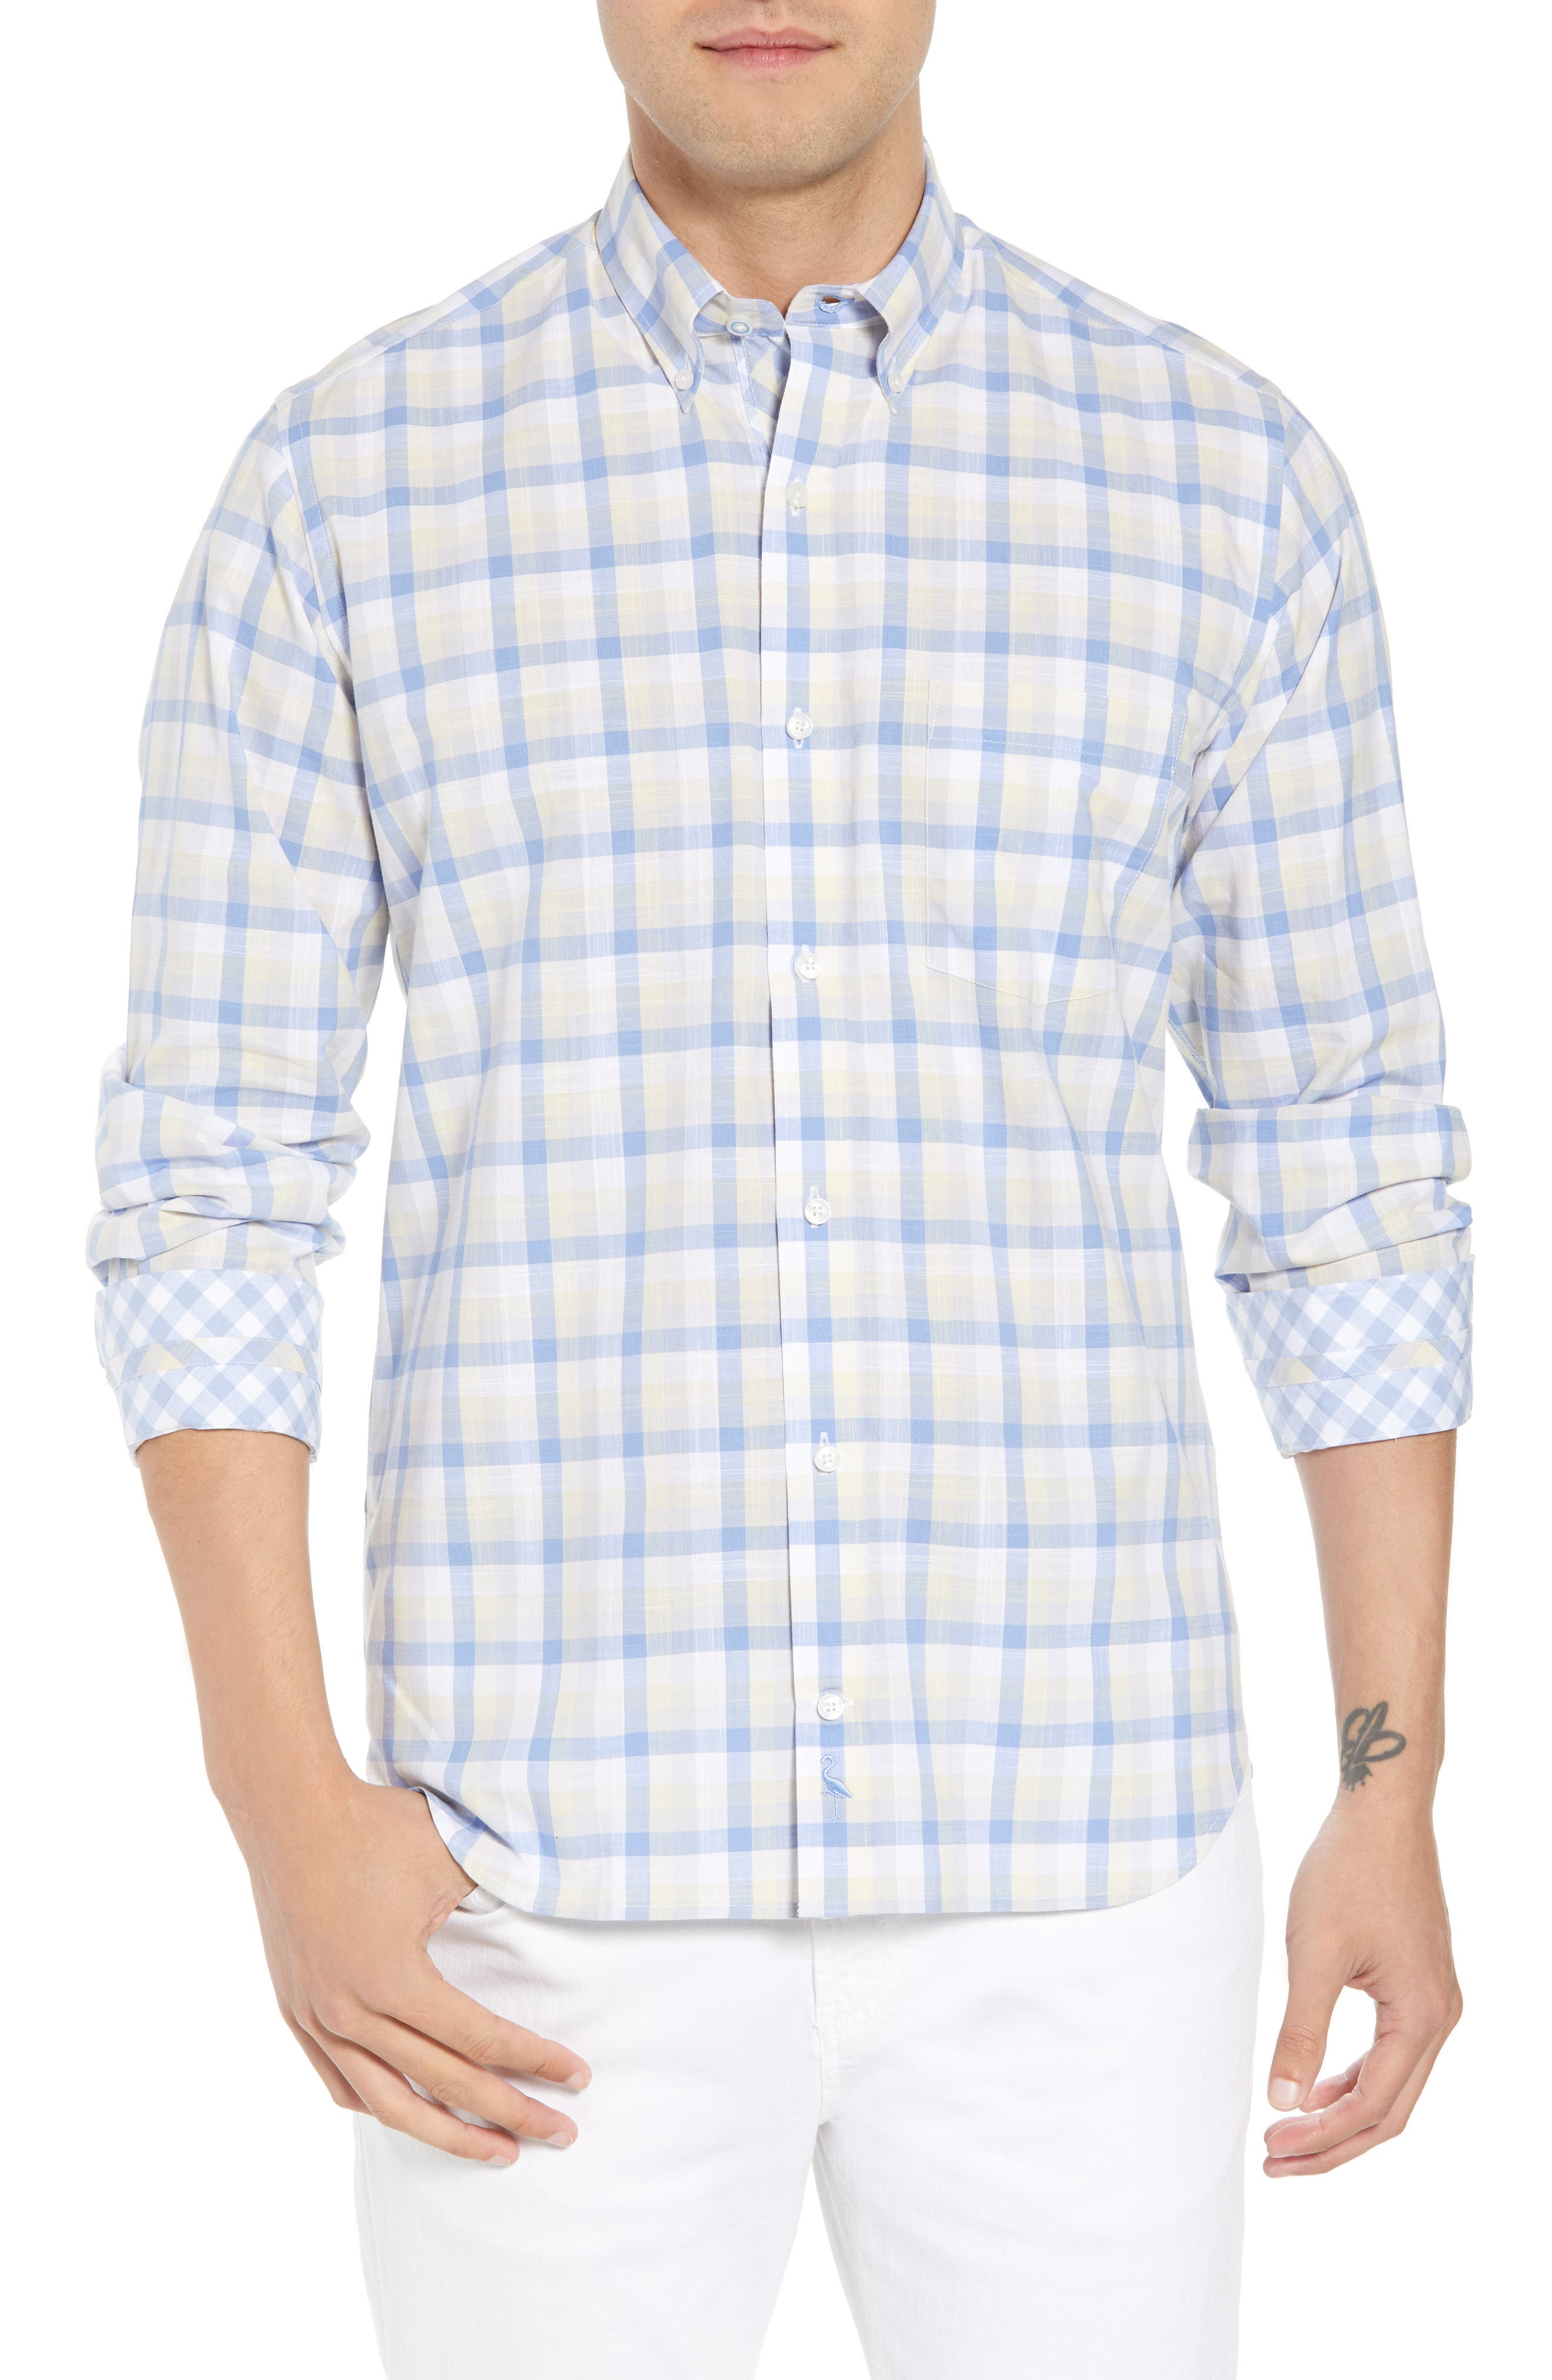 Hobbes Regular Fit Check Sport Shirt,                             Main thumbnail 1, color,                             450